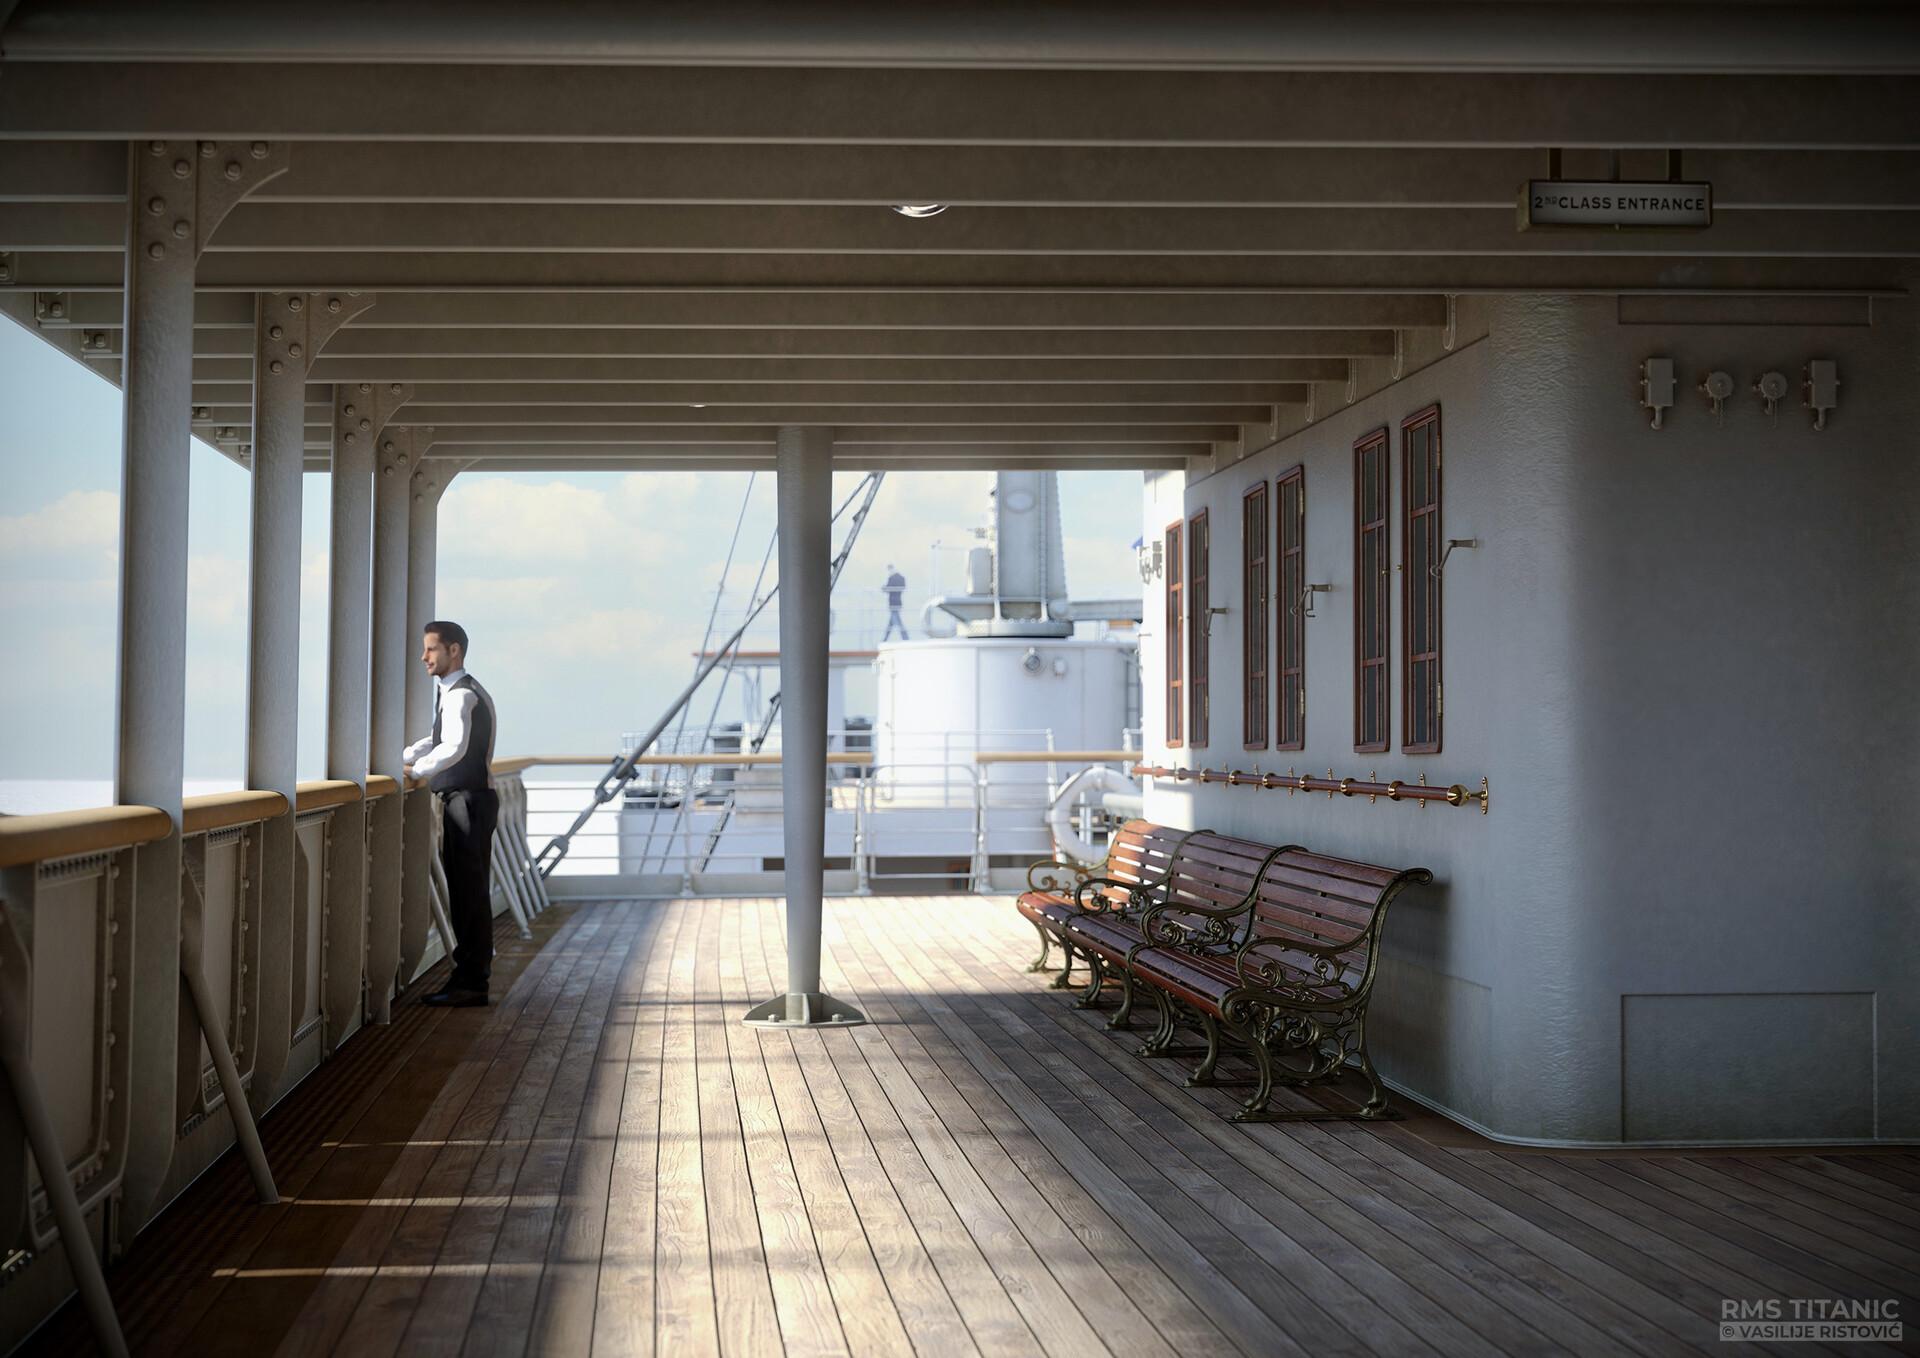 Montage Titanic Trumpeter 1/200 - Page 10 Vasilije-ristovic-titanic-2nd-class-promenade-web-sn